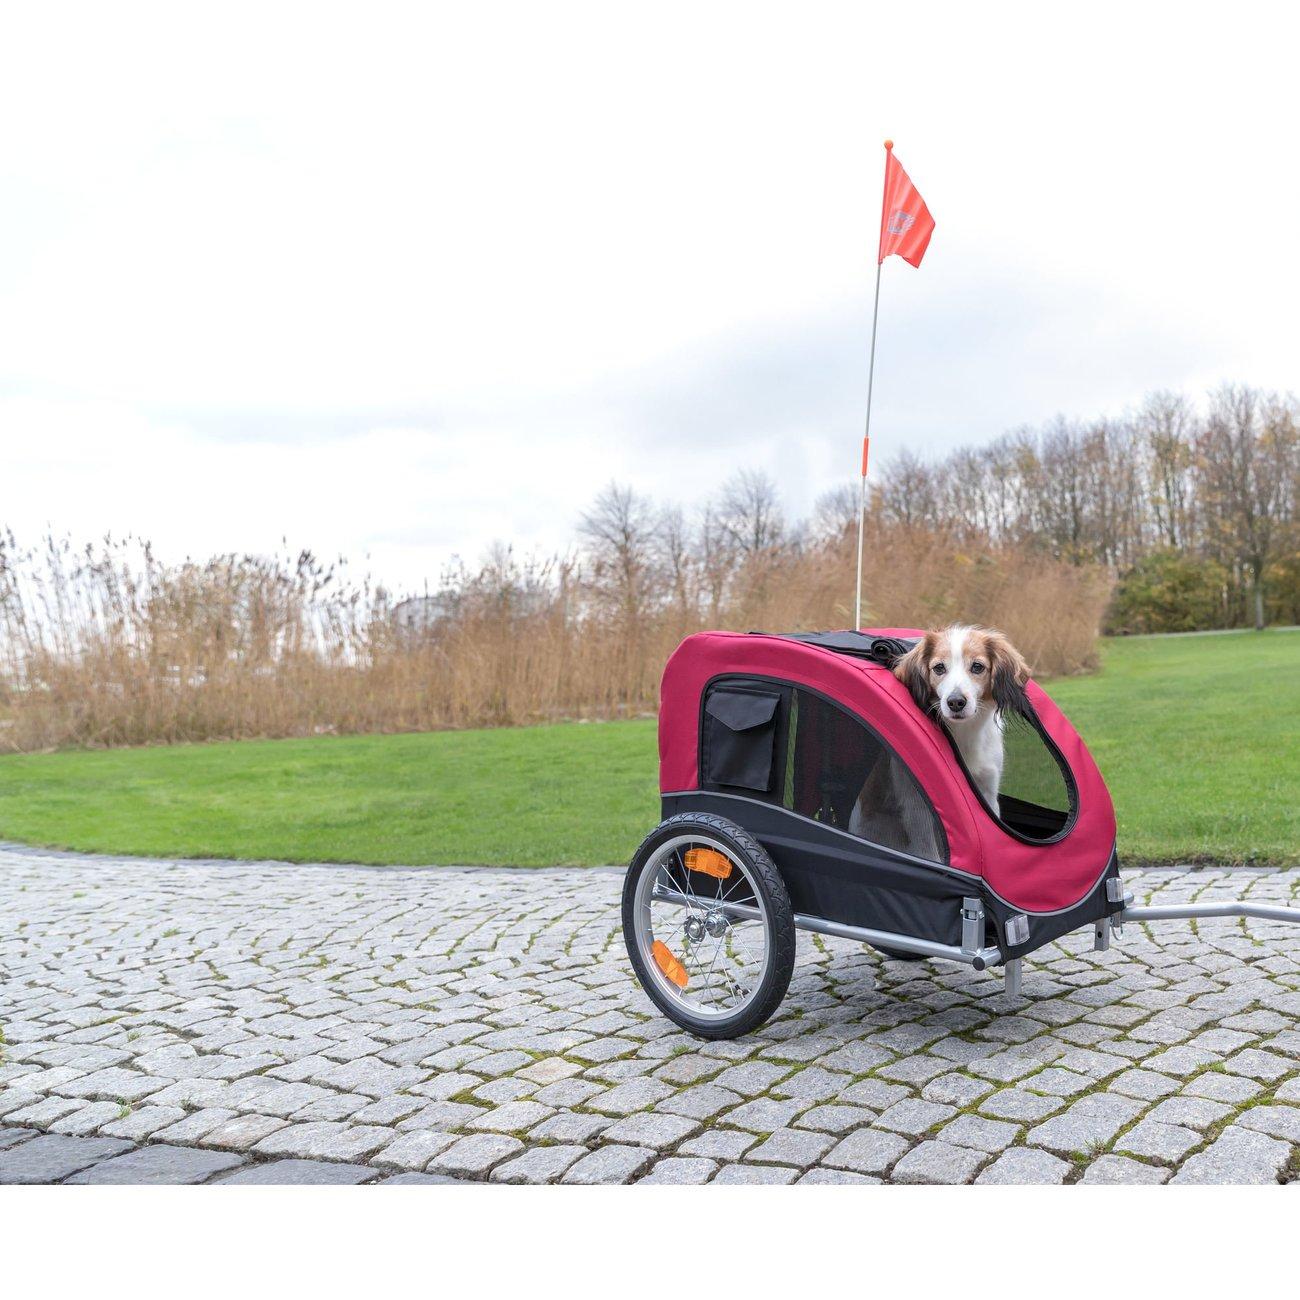 Fahrradanhänger für Hunde Bild 11